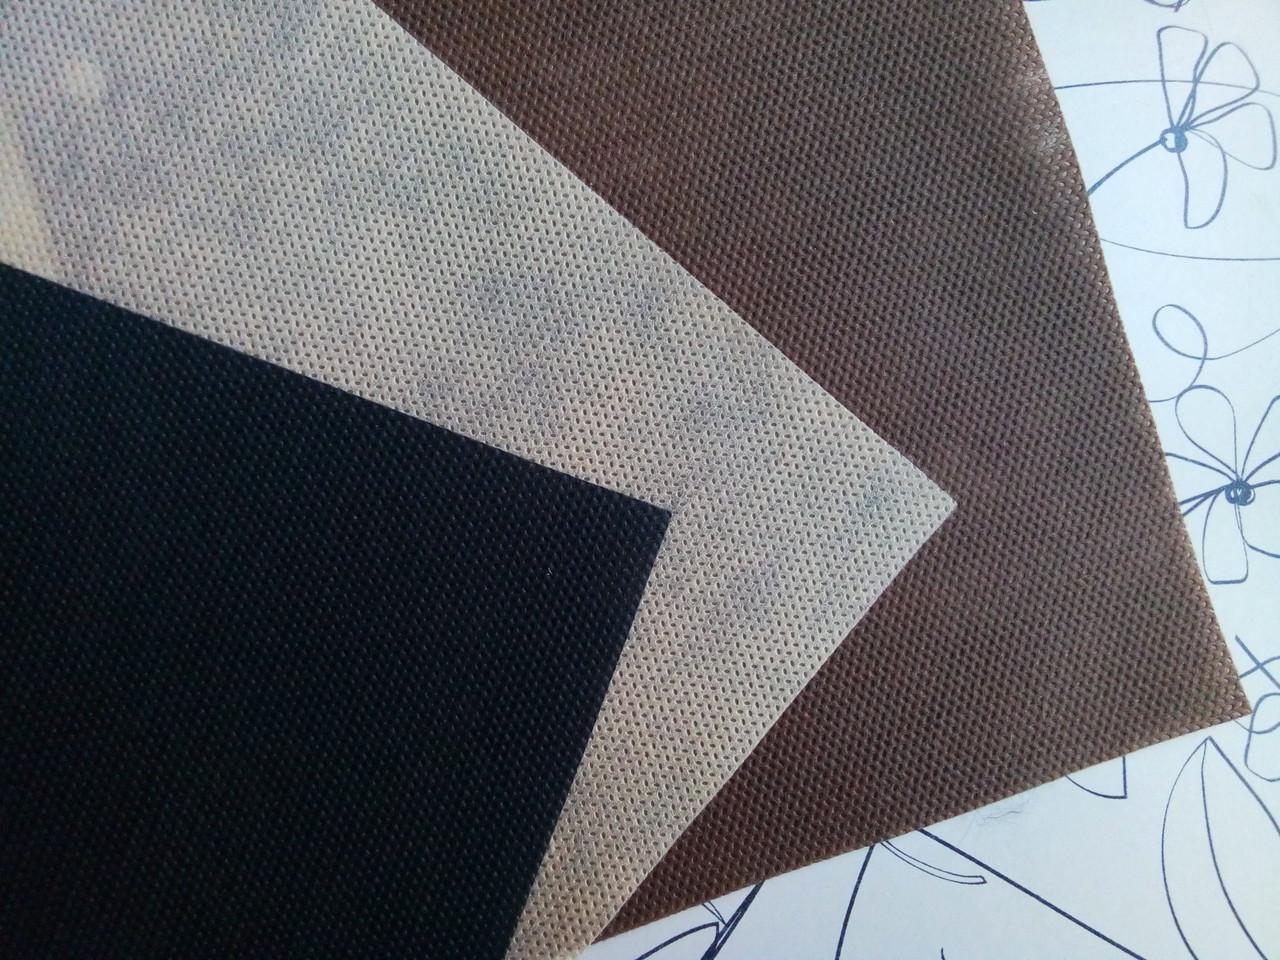 Флизелин 60 1.6 беж коричневый черный